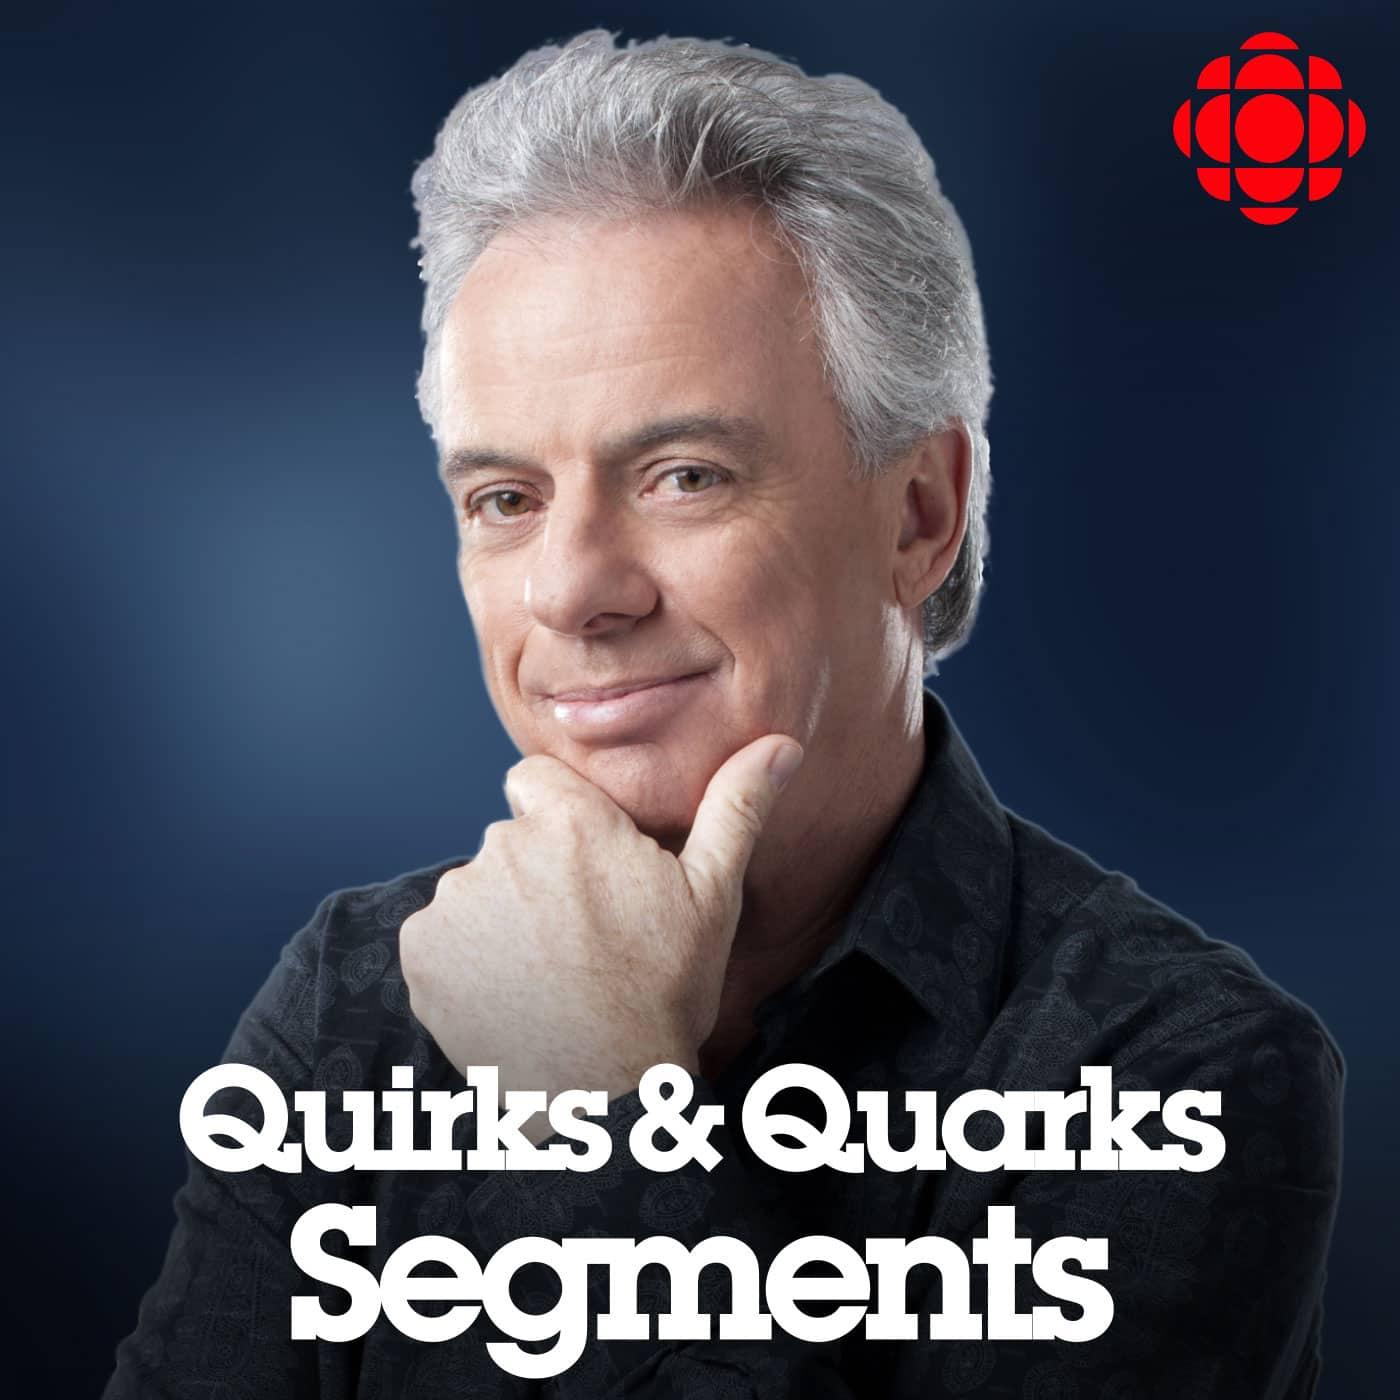 Quirks and Quarks Segmented Show from CBC Radio:CBC Radio